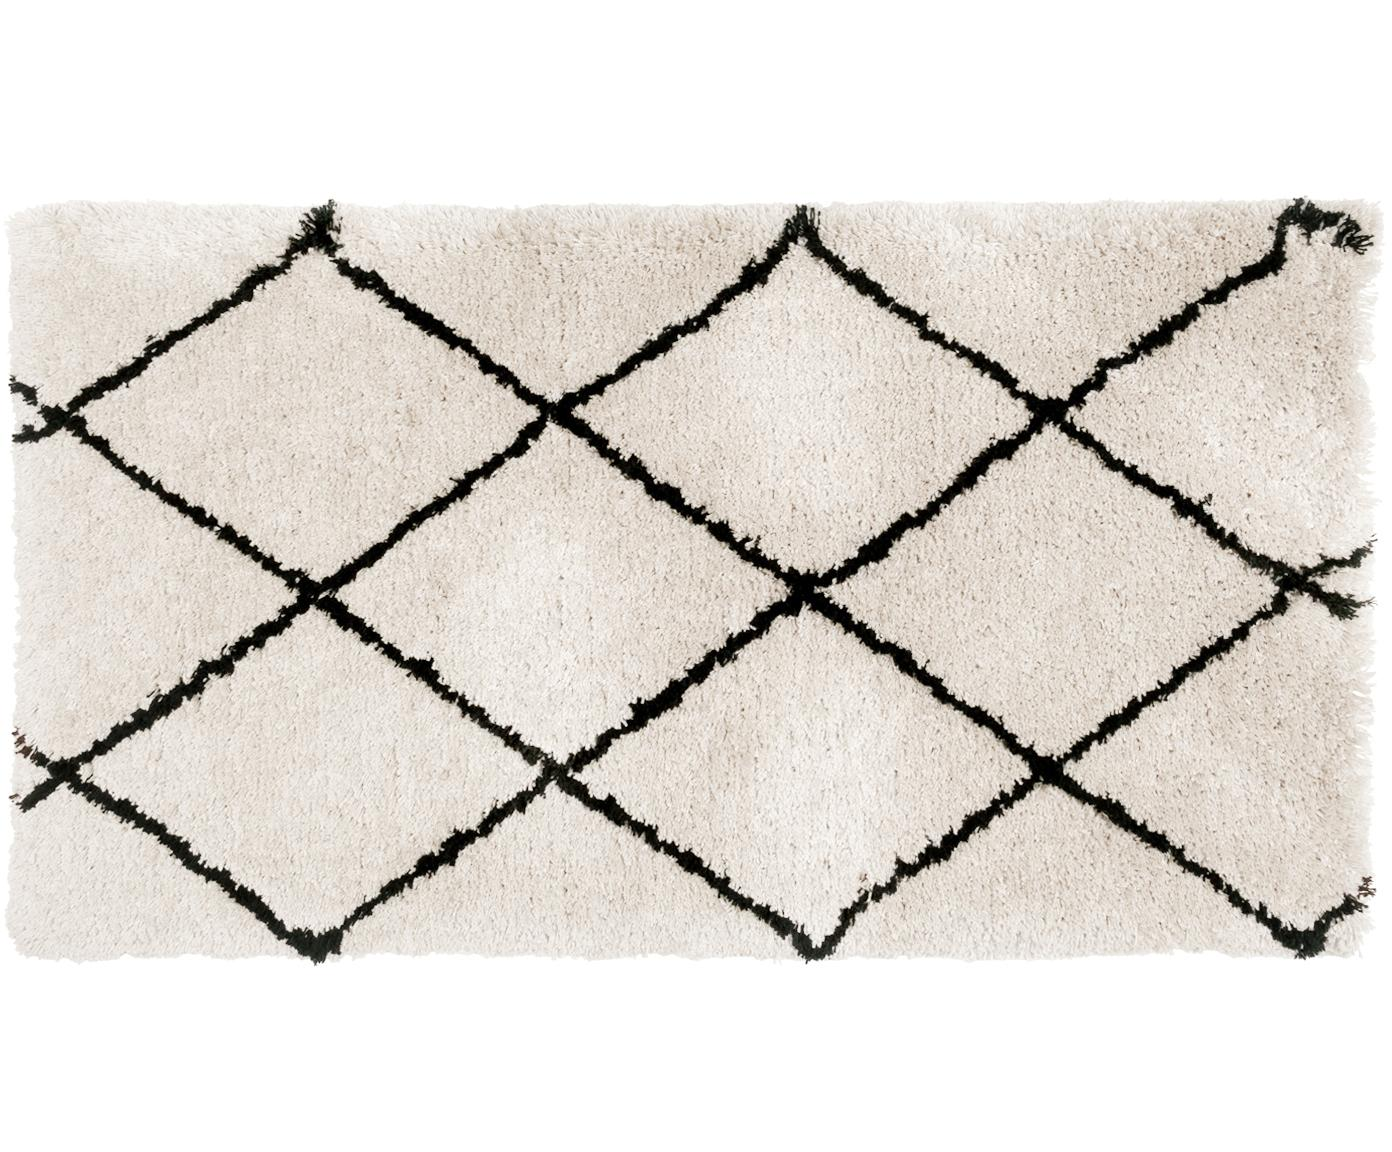 Alfombra artesanal de pelo largo Naima, Parte superior: 100%poliéster, Reverso: 100%algodón, Beige, negro, An 80 x L 150 cm (Tamaño XS)